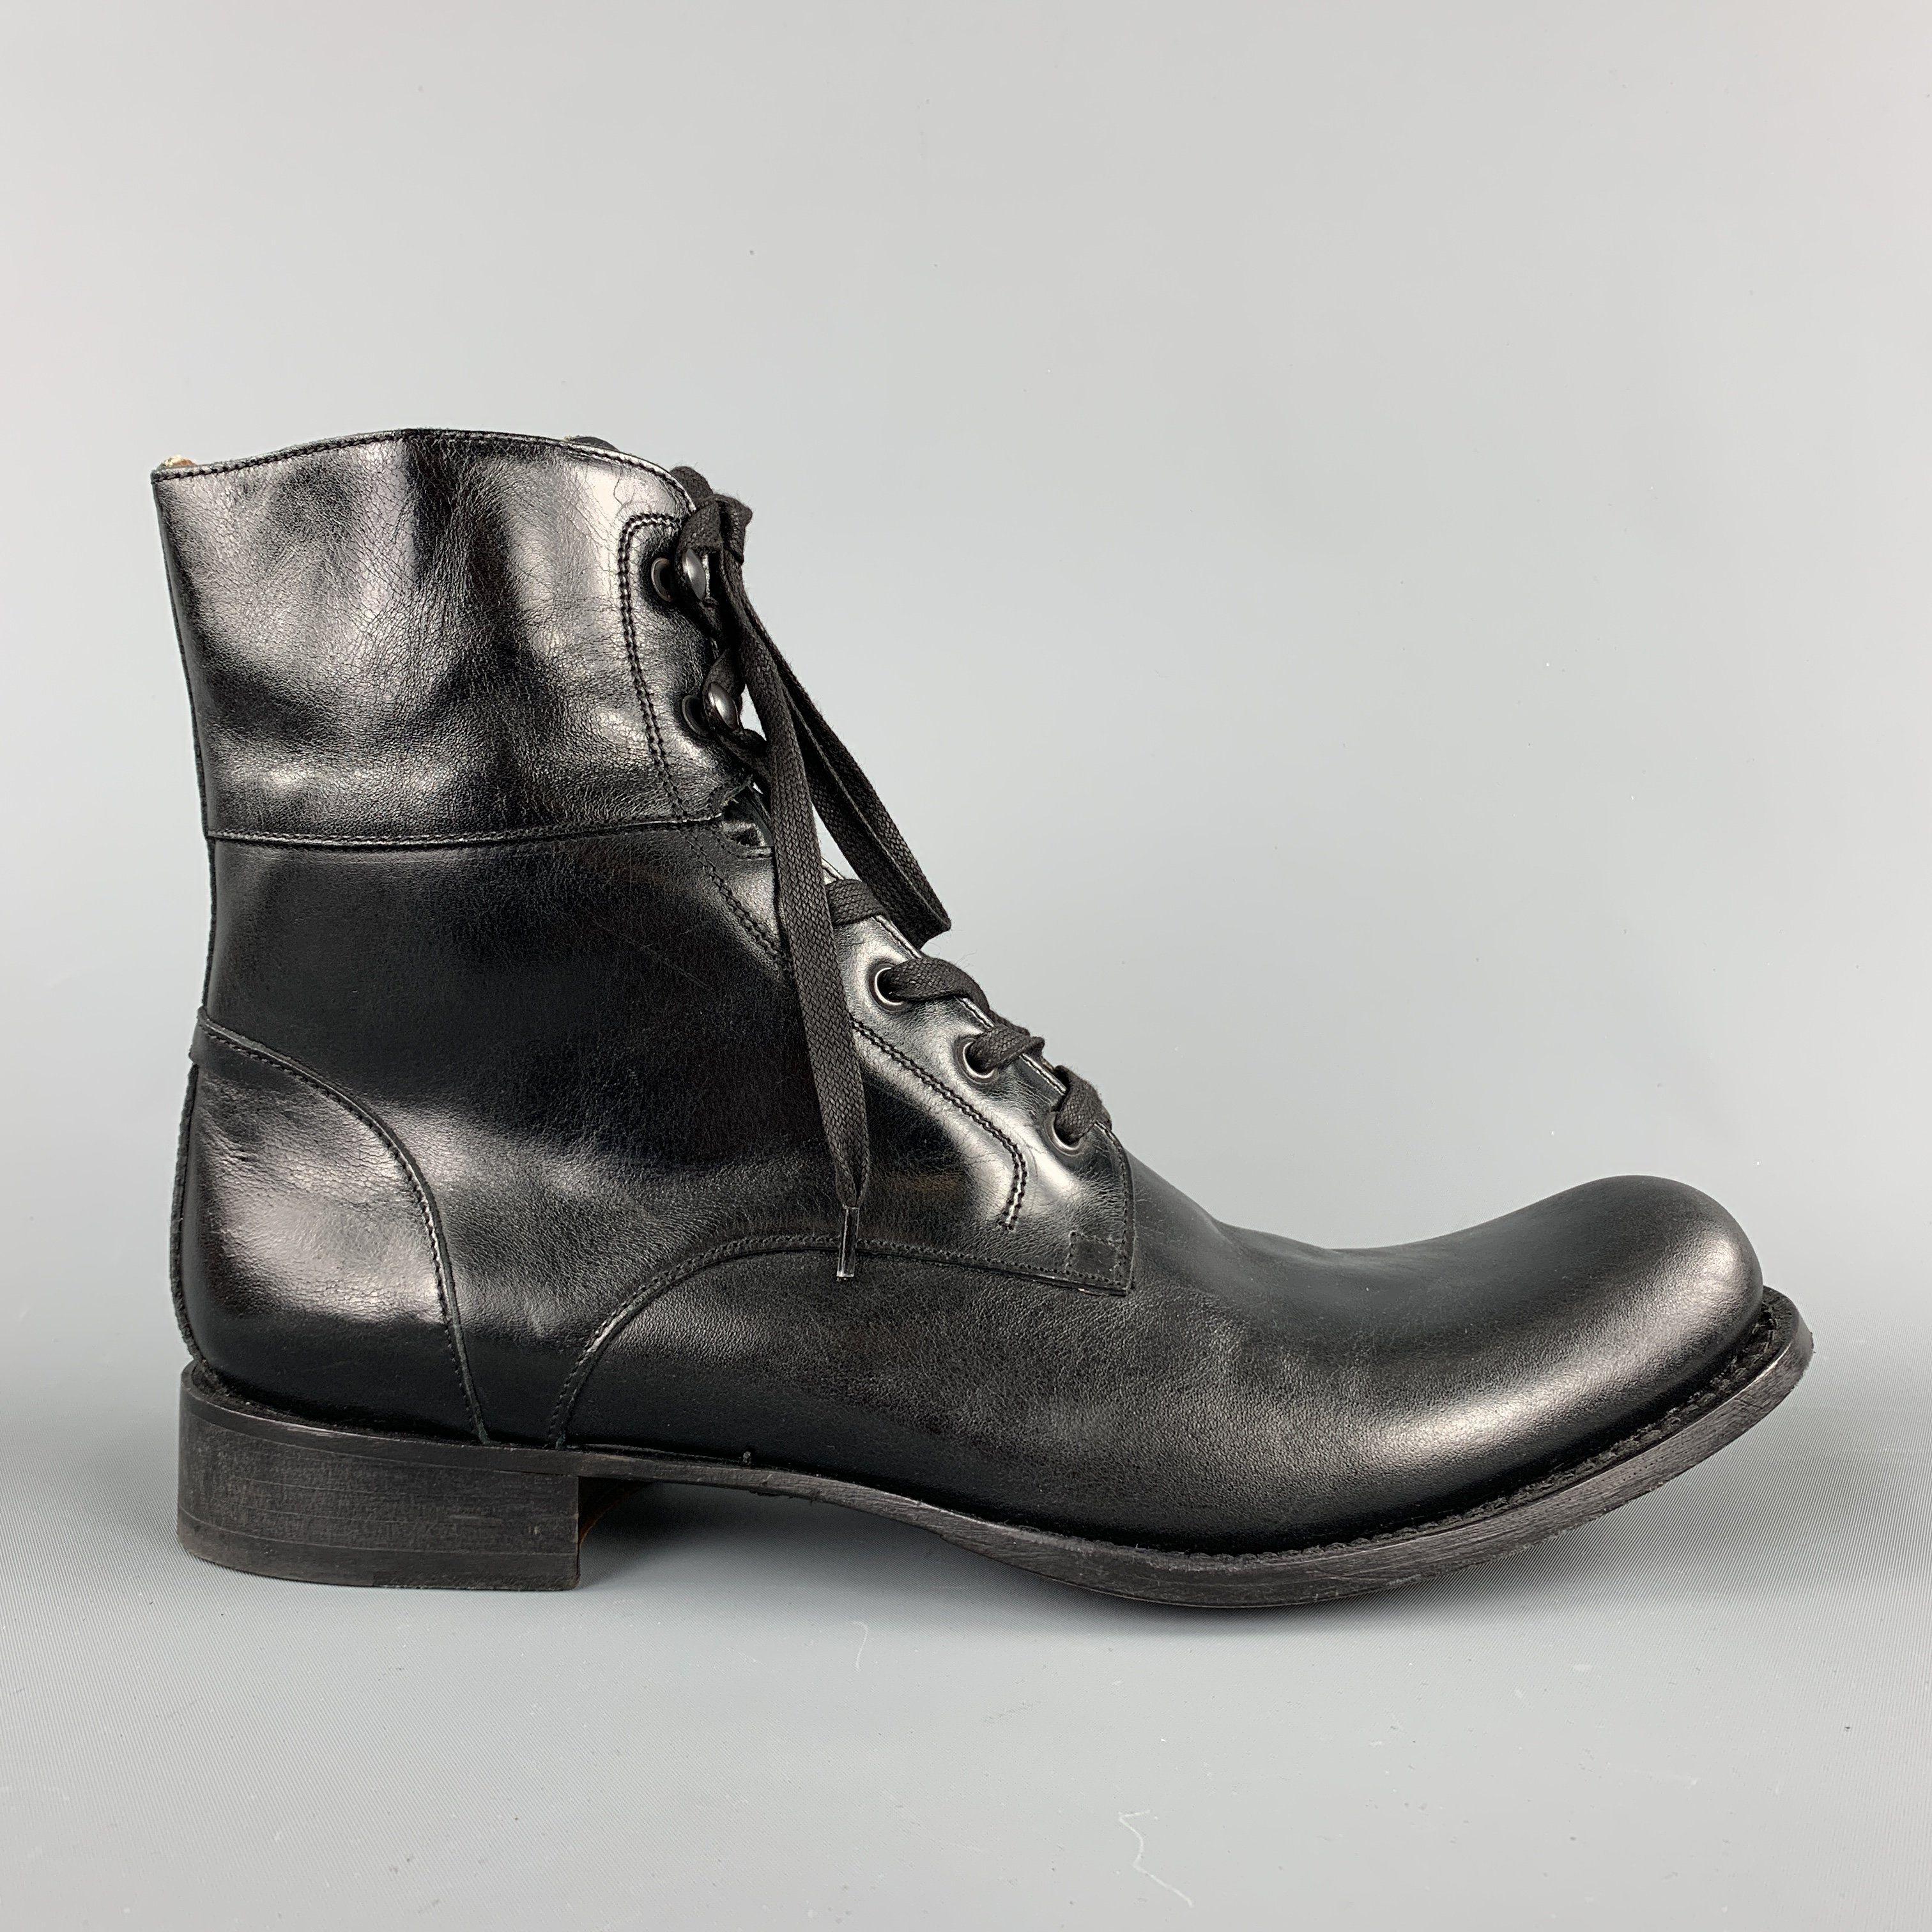 John Varvatos Size 12 Black Leather